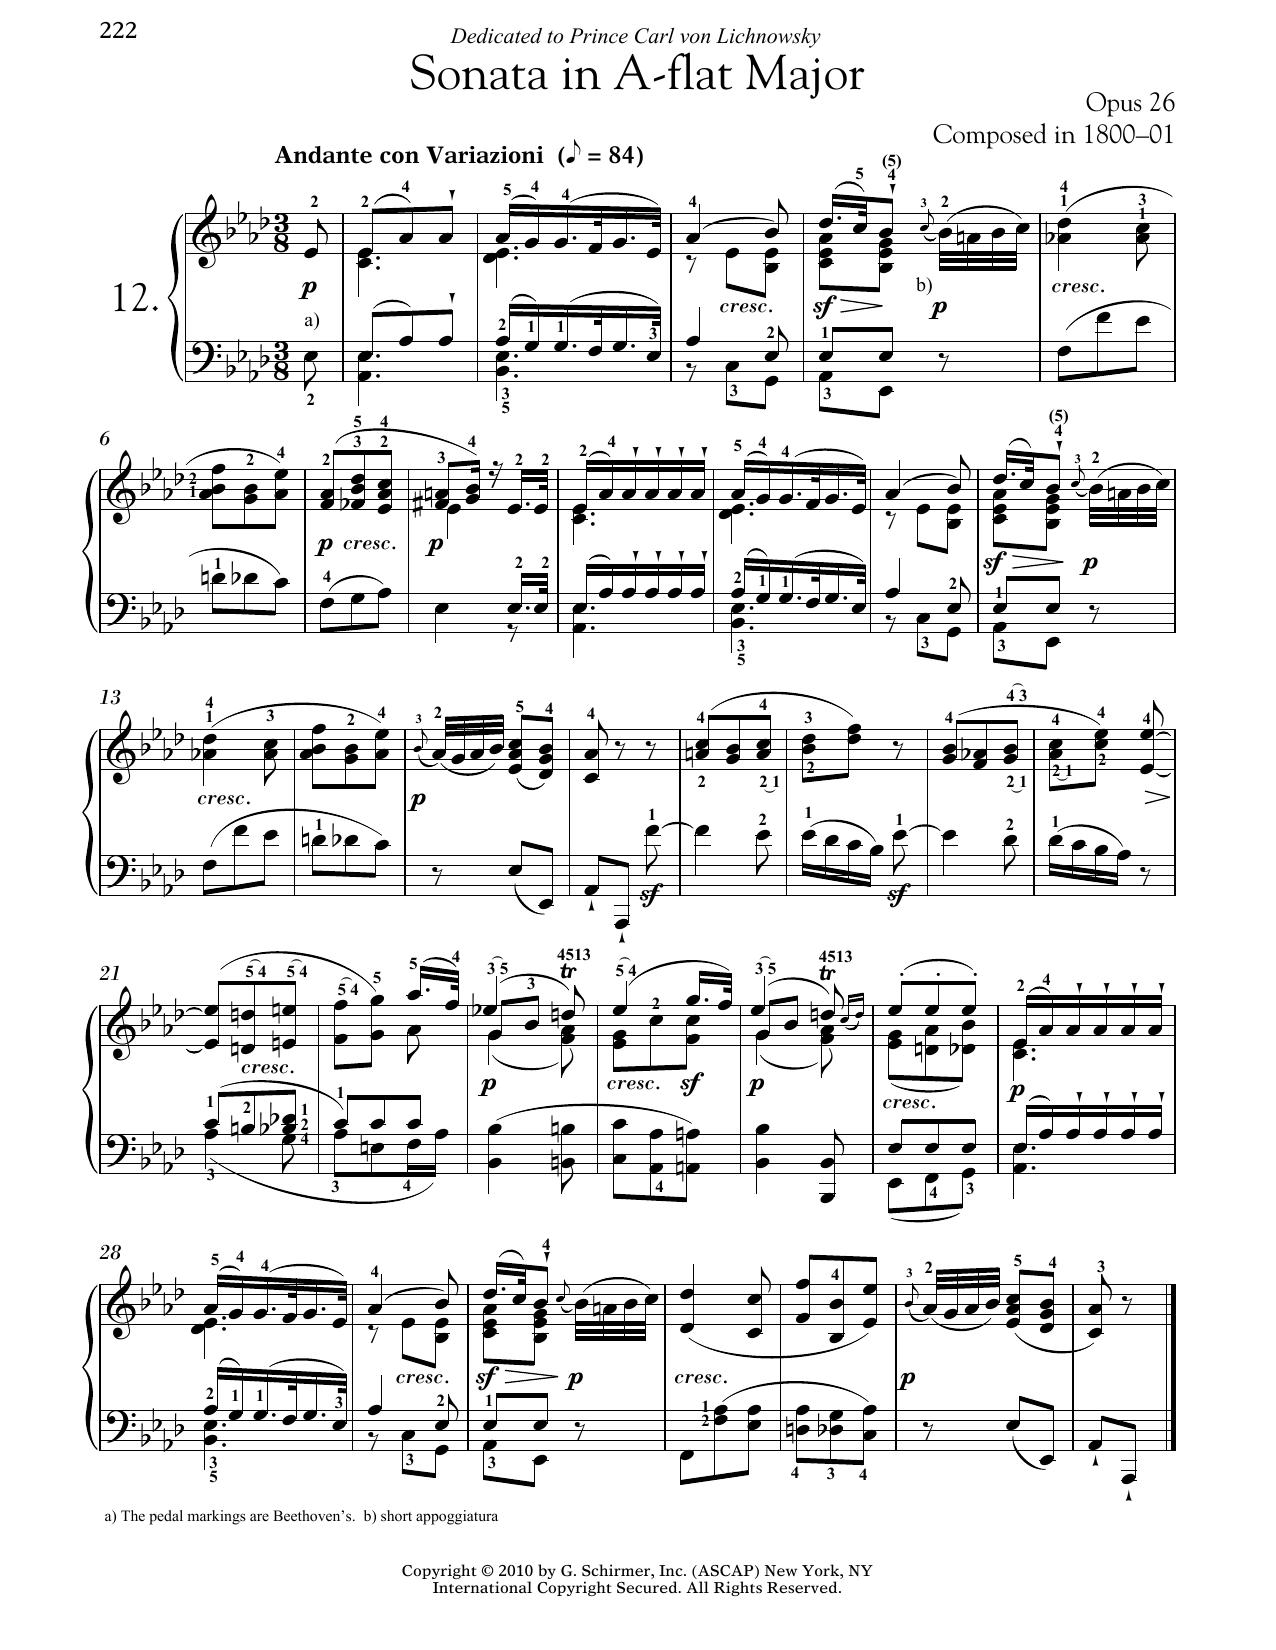 Piano Sonata No. 12 In A-flat Major, Op. 26 Partition Digitale